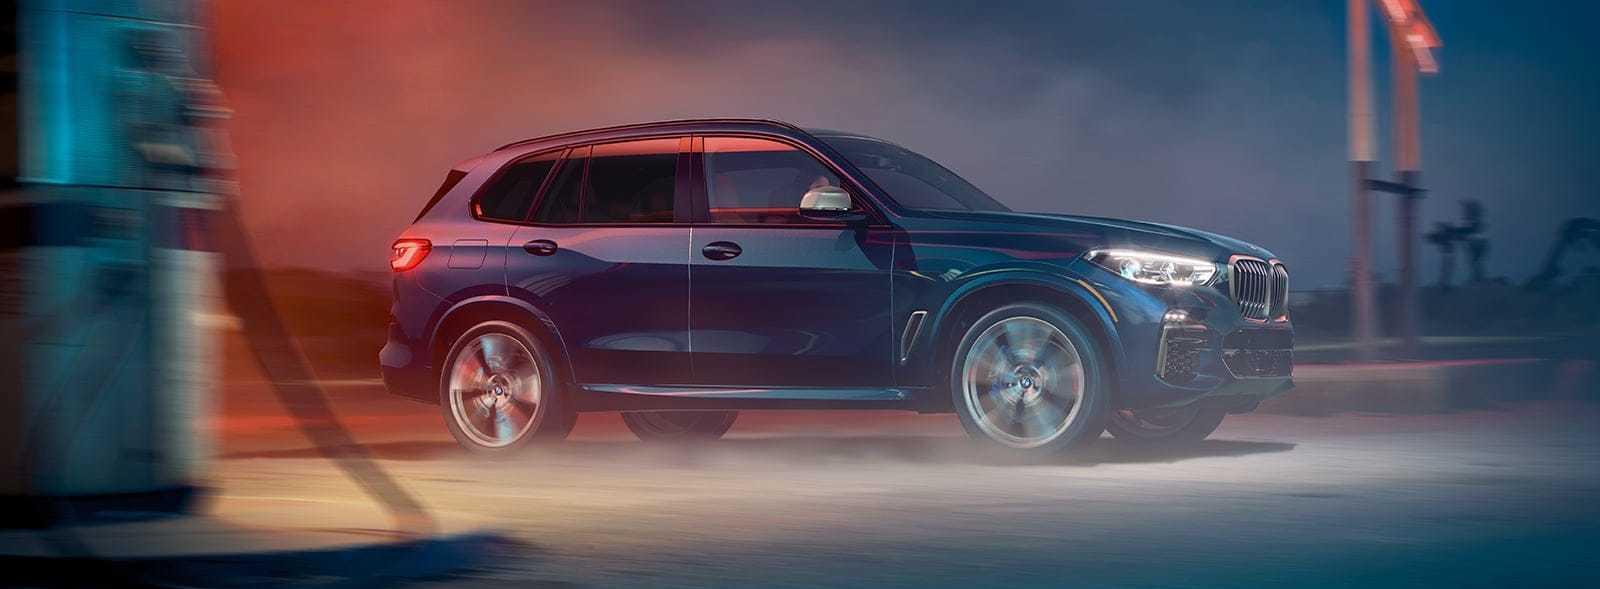 2020 BMW X5 vs 2020 Cadillac XT5 near Texarkana, TX